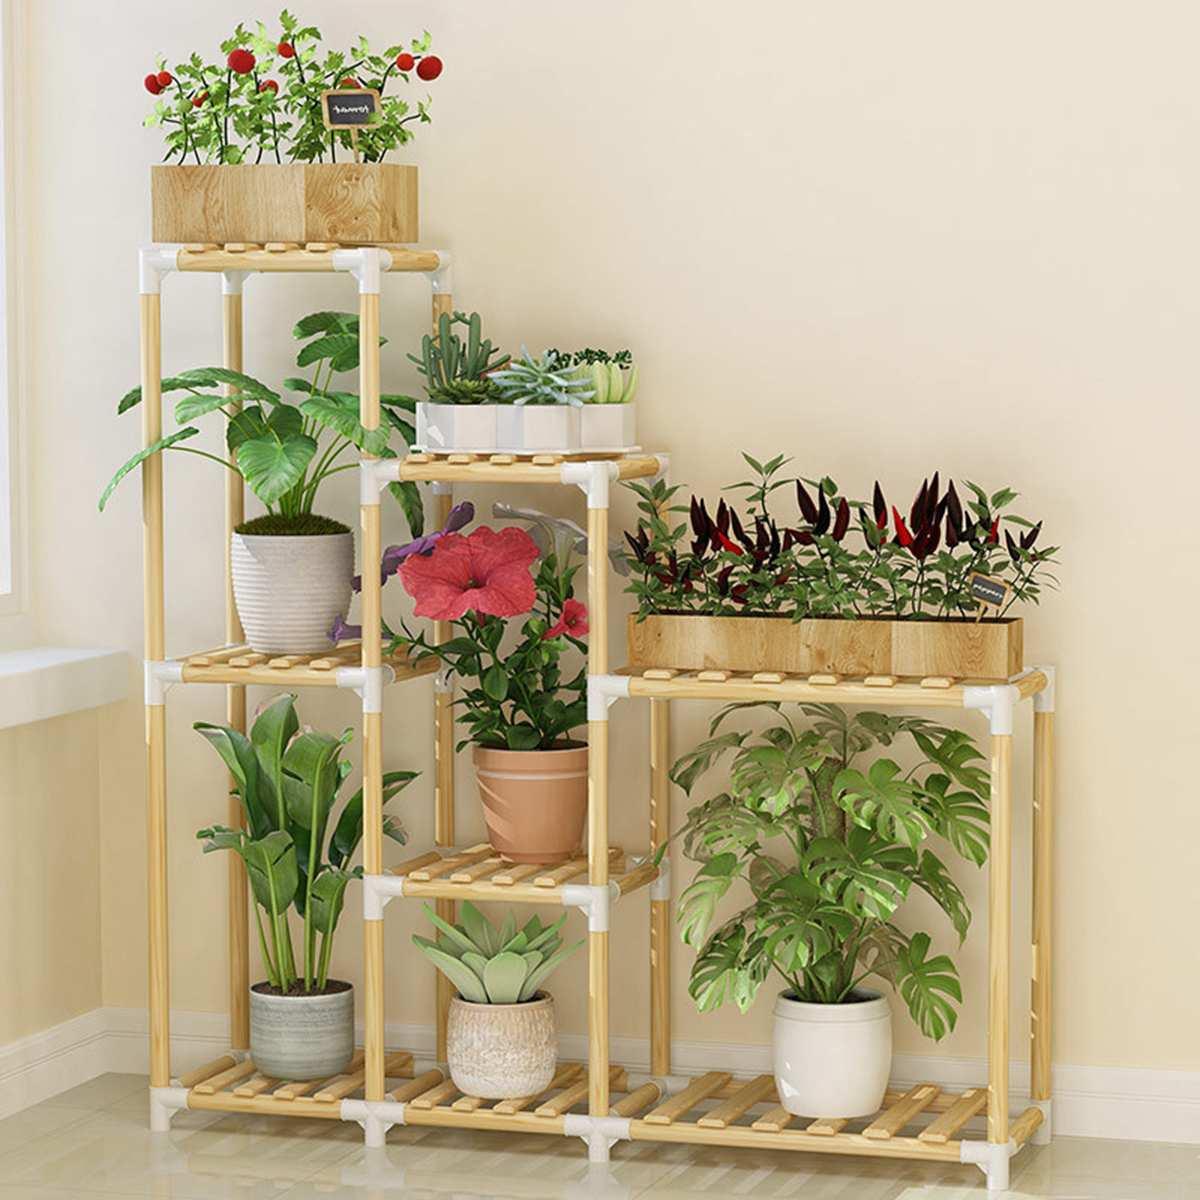 Estante de madera para flores, soporte para plantas, soporte para flores multicapa, estantes para flores de balcón, estante para flores, Bar de café, jardín interior, soporte de plantas de madera